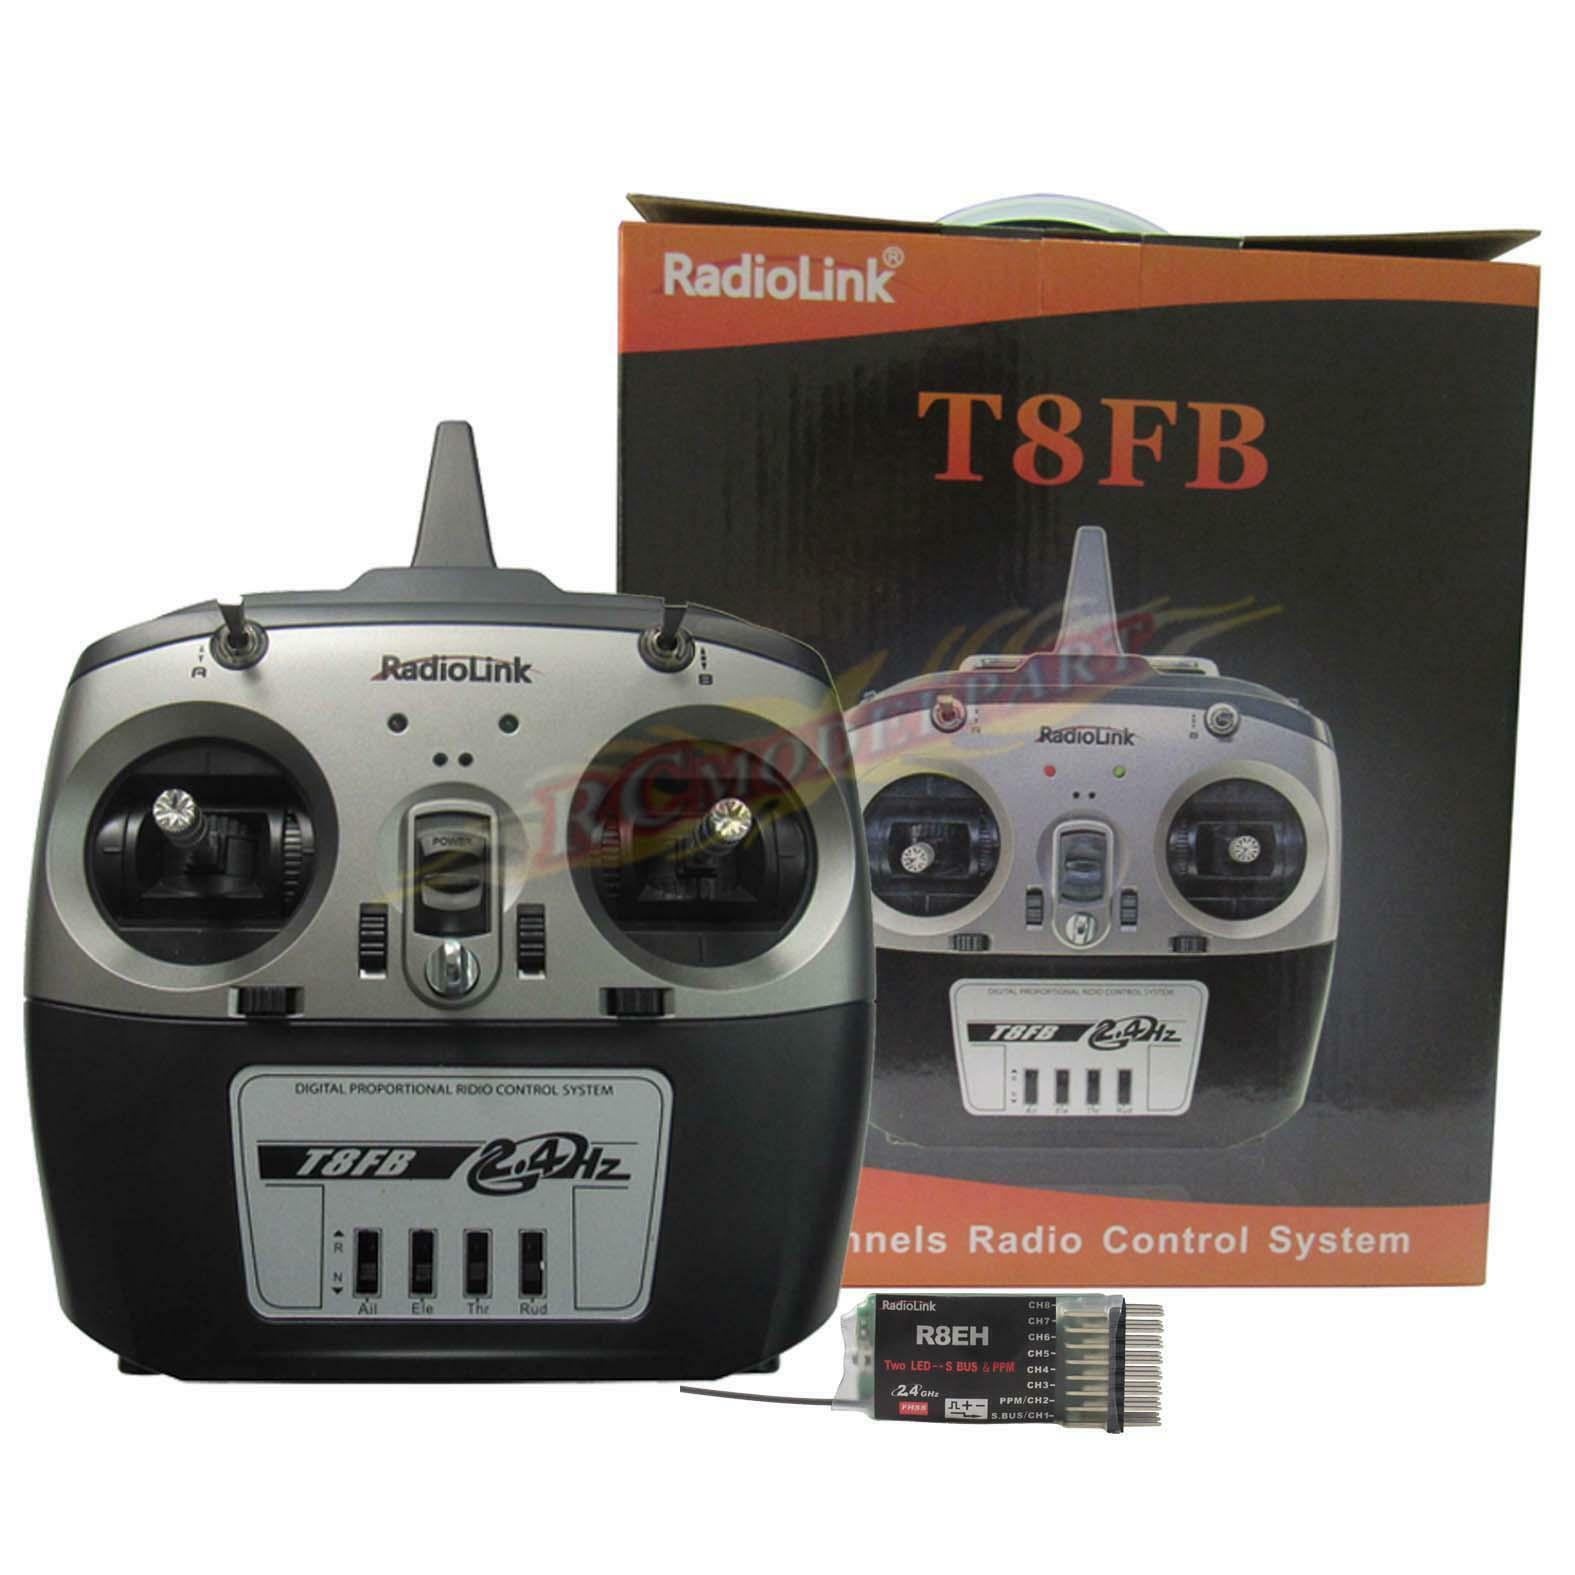 Radiolink 2.4G T8FB R8EH sistema de control remoto 8CH Transmisor Receptor & modo 2